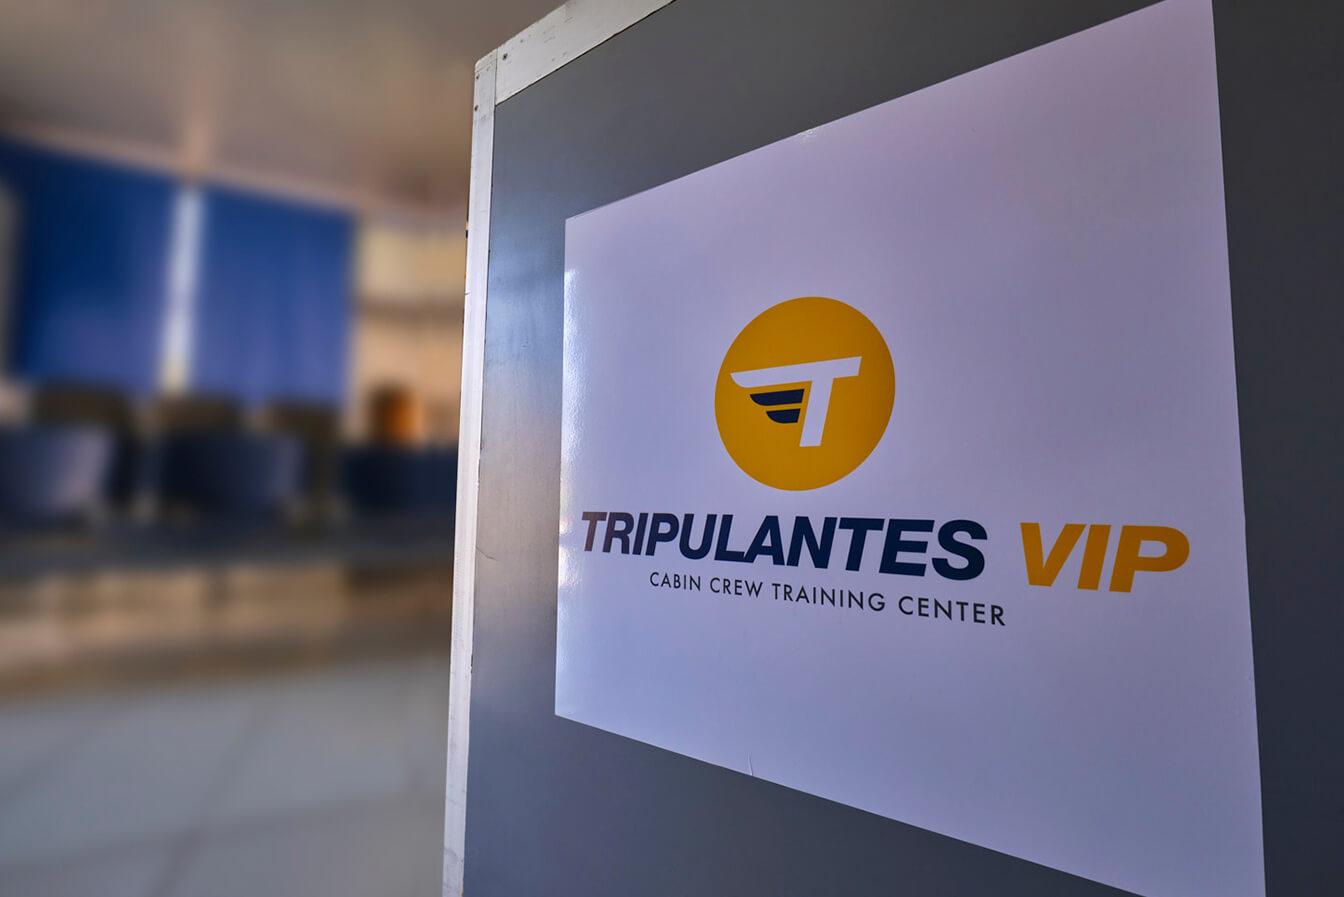 Tripulantes VIP